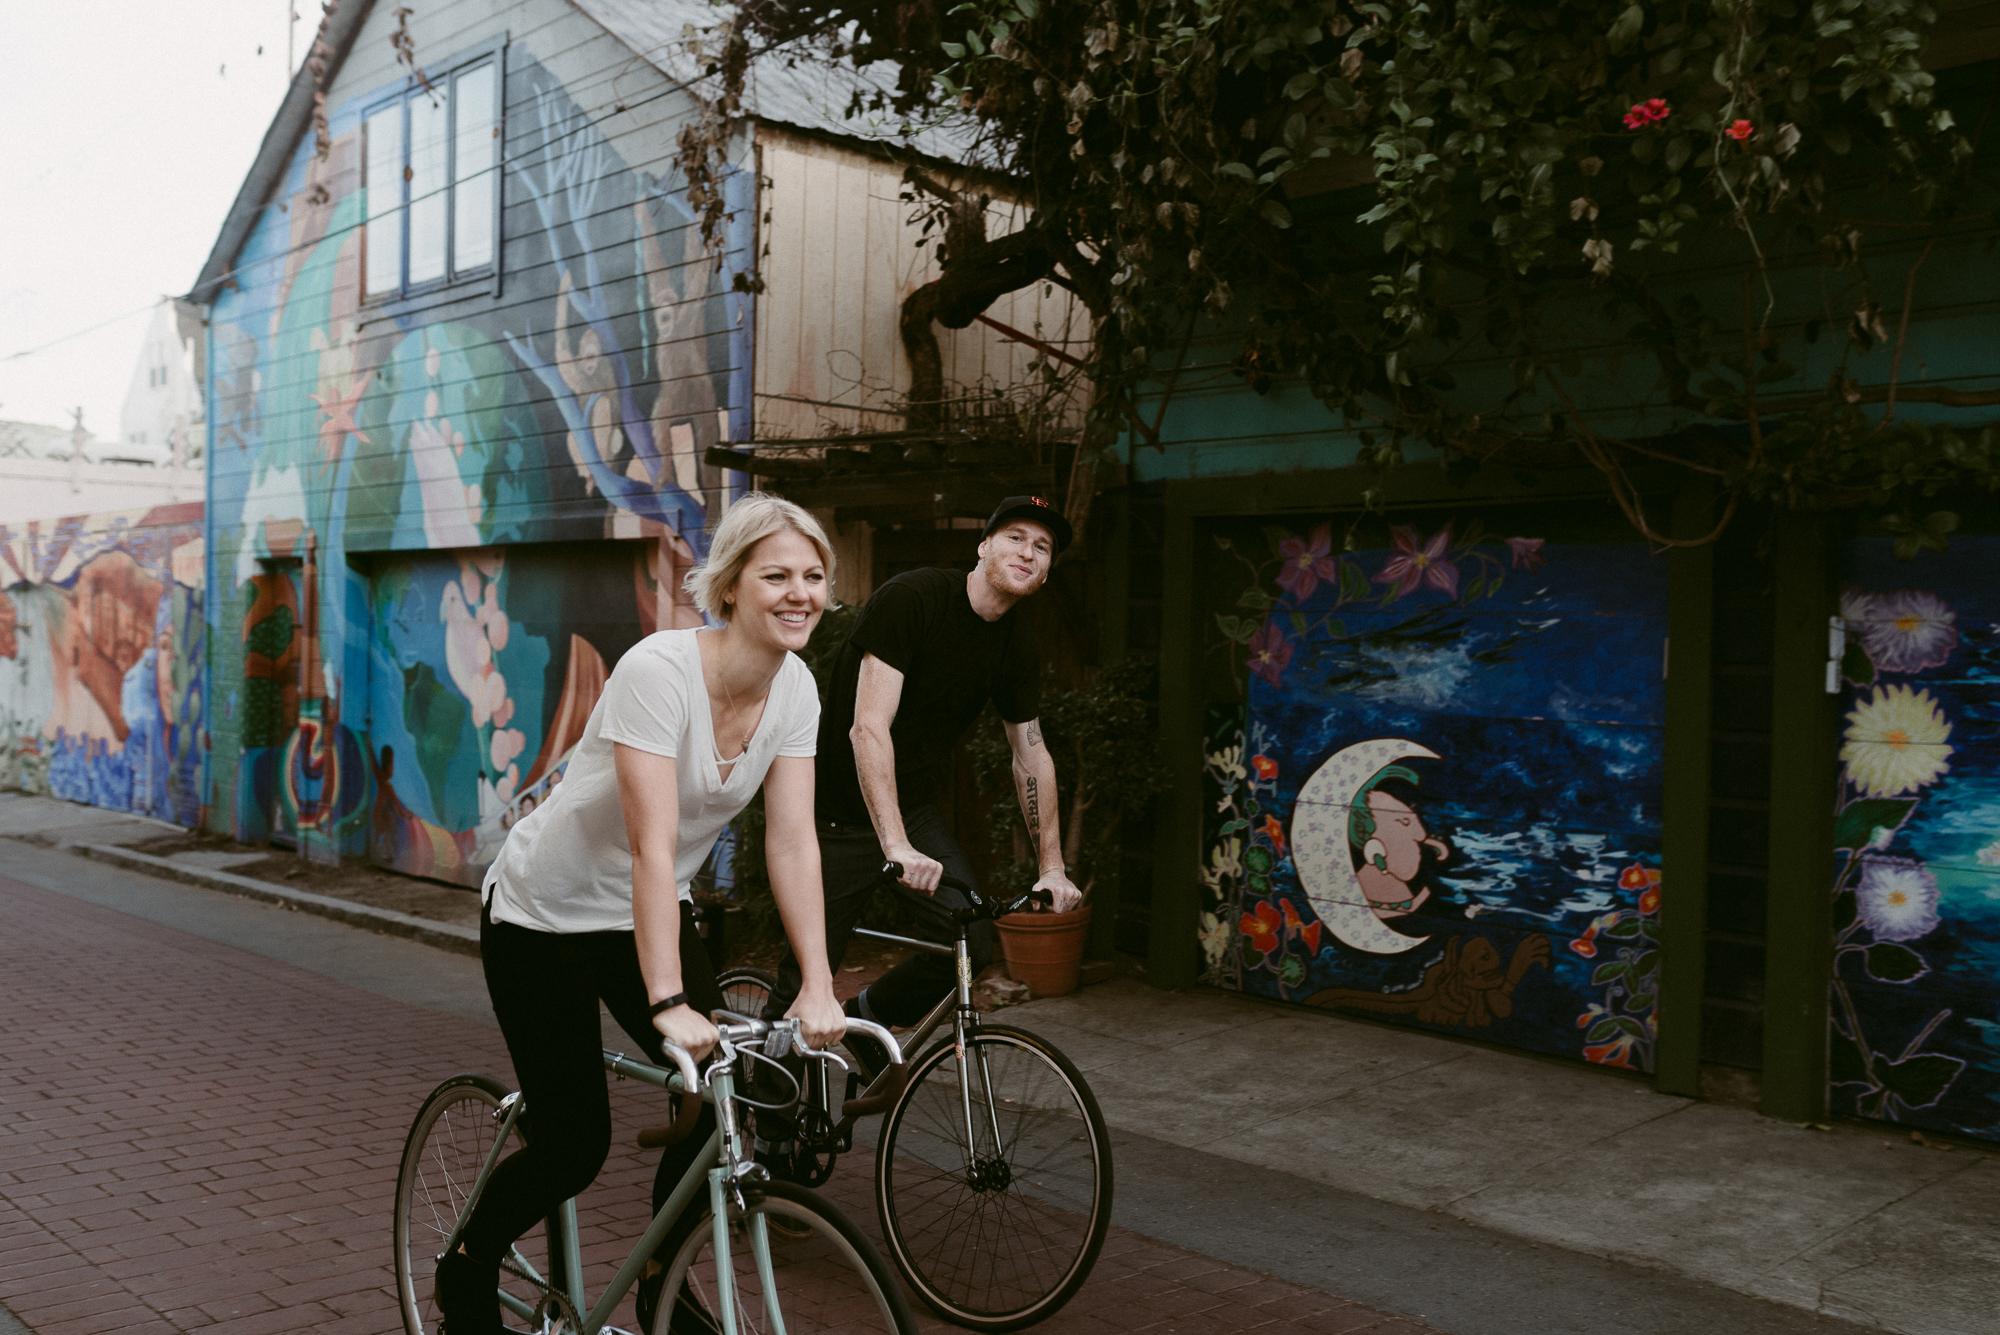 Fun Engagement Portraits in San Francisco on Bikes